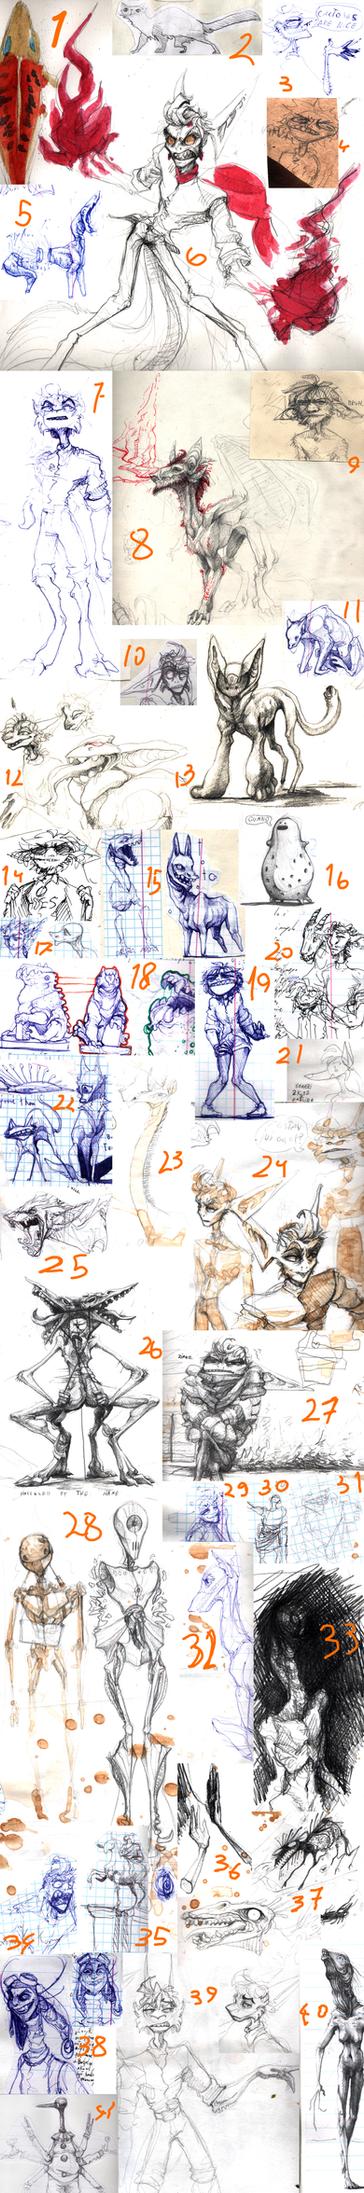 Sketch dump  - 23 by Nepook